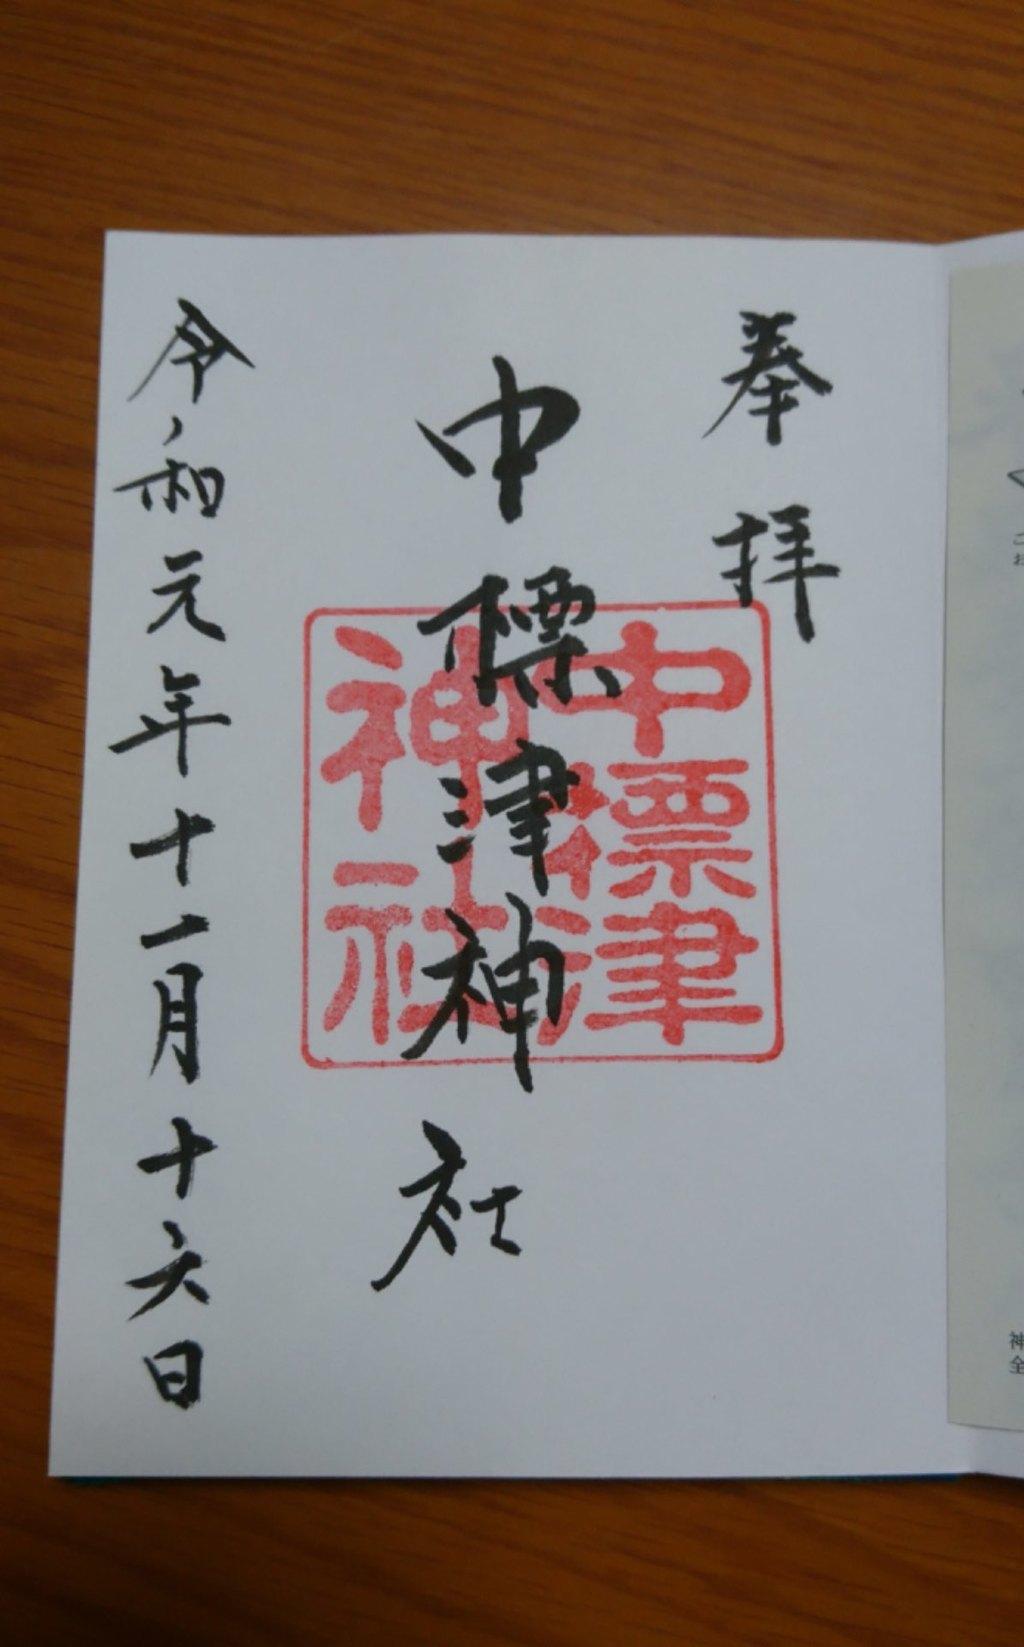 中標津神社の御朱印